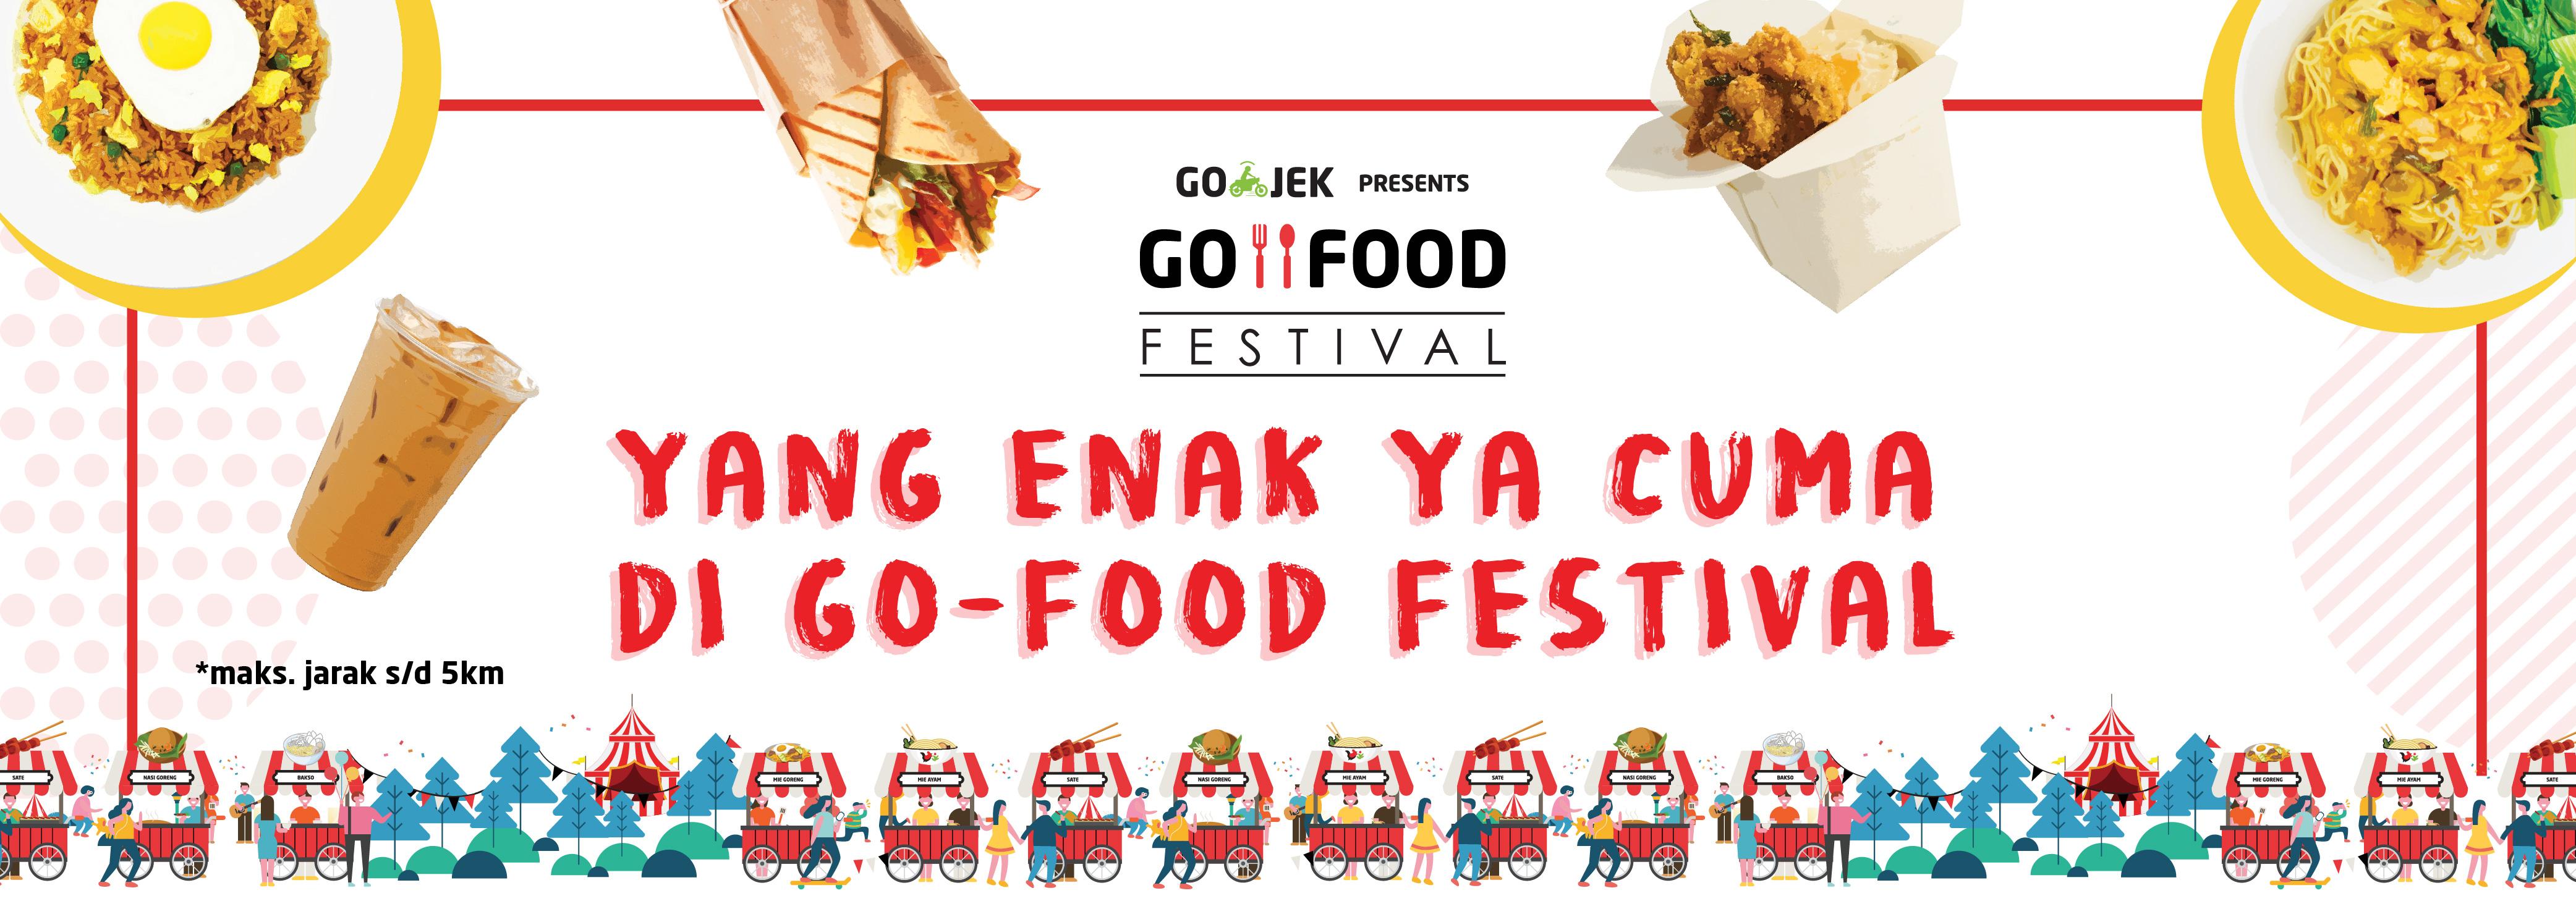 Nikmati Cashback Hingga 50% di GO-FOOD Festival Jakarta!